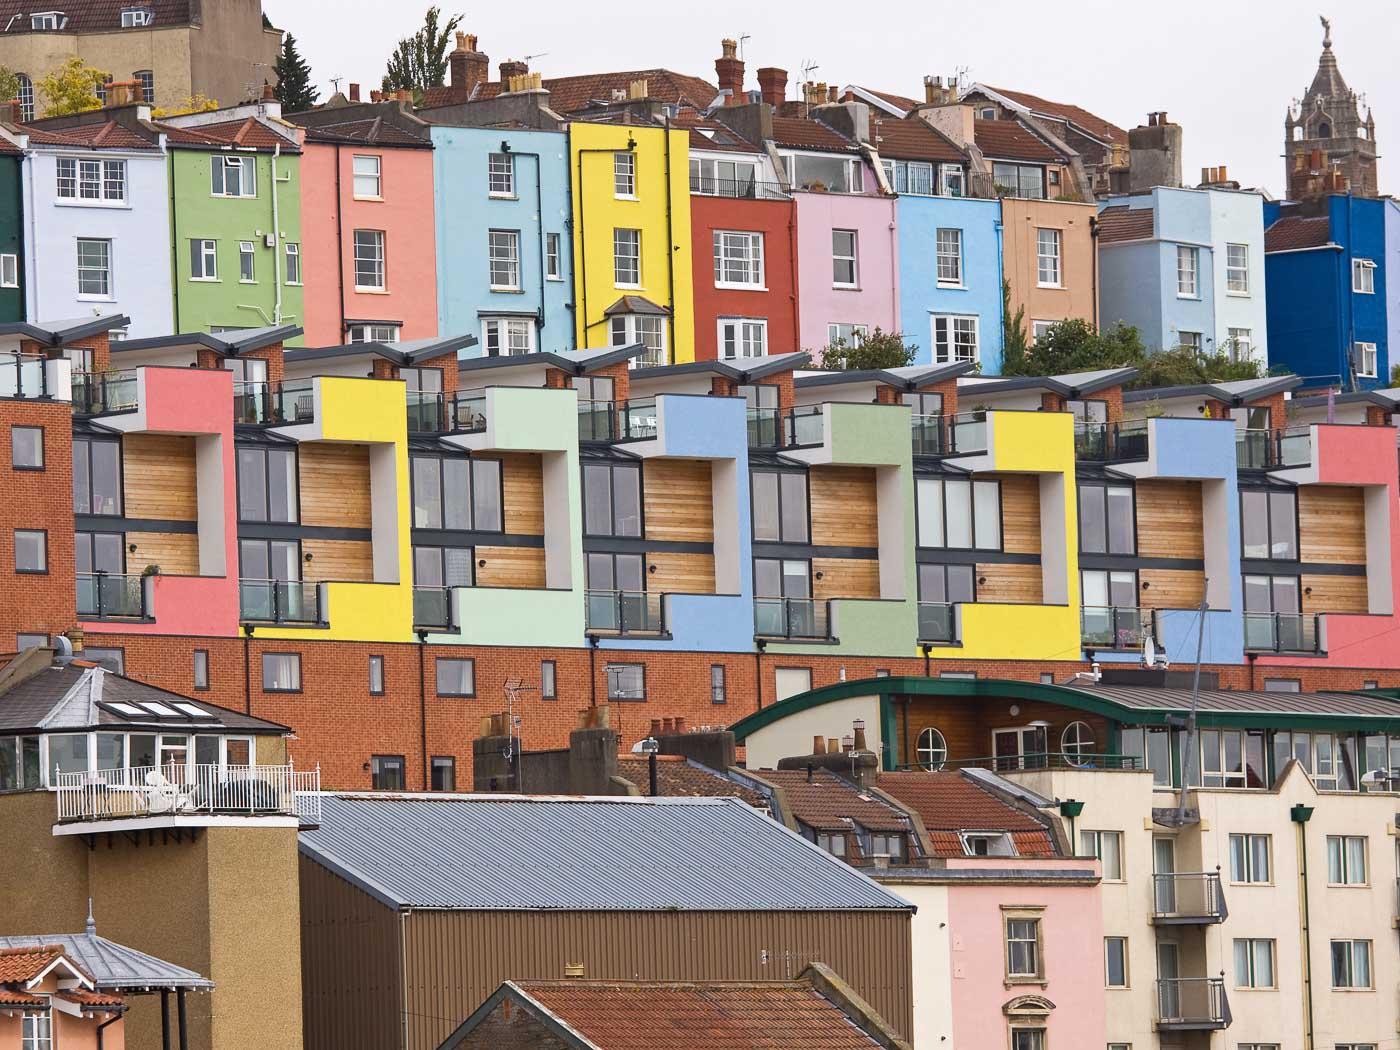 Colourful Cities by Zayah World - Bristol, UK